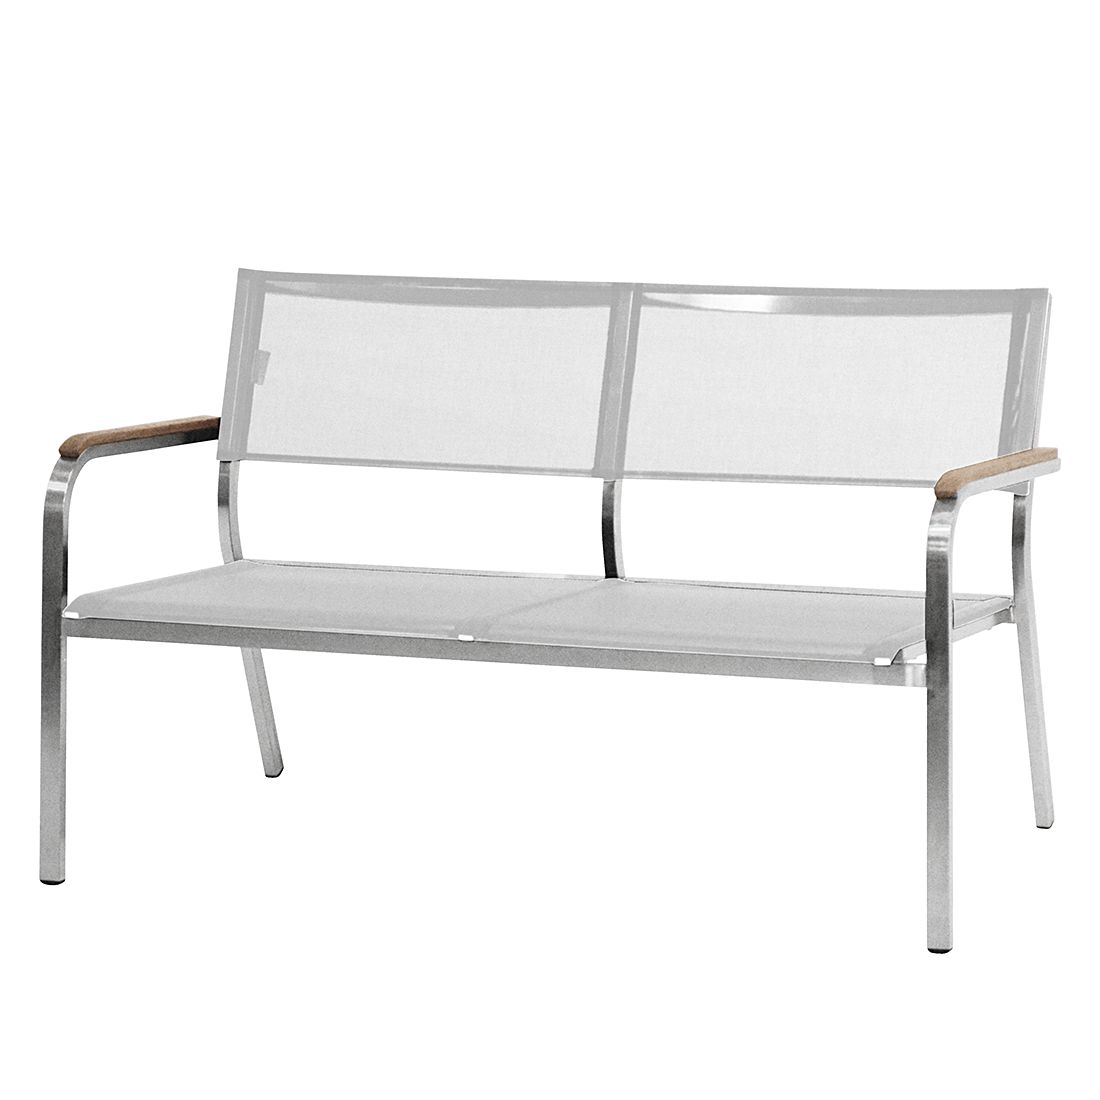 Lounge-Bank Lux XL - Edelstahl/Batyline®/Teak massiv - Weiß - 126 x 75 cm, Jan Kurtz